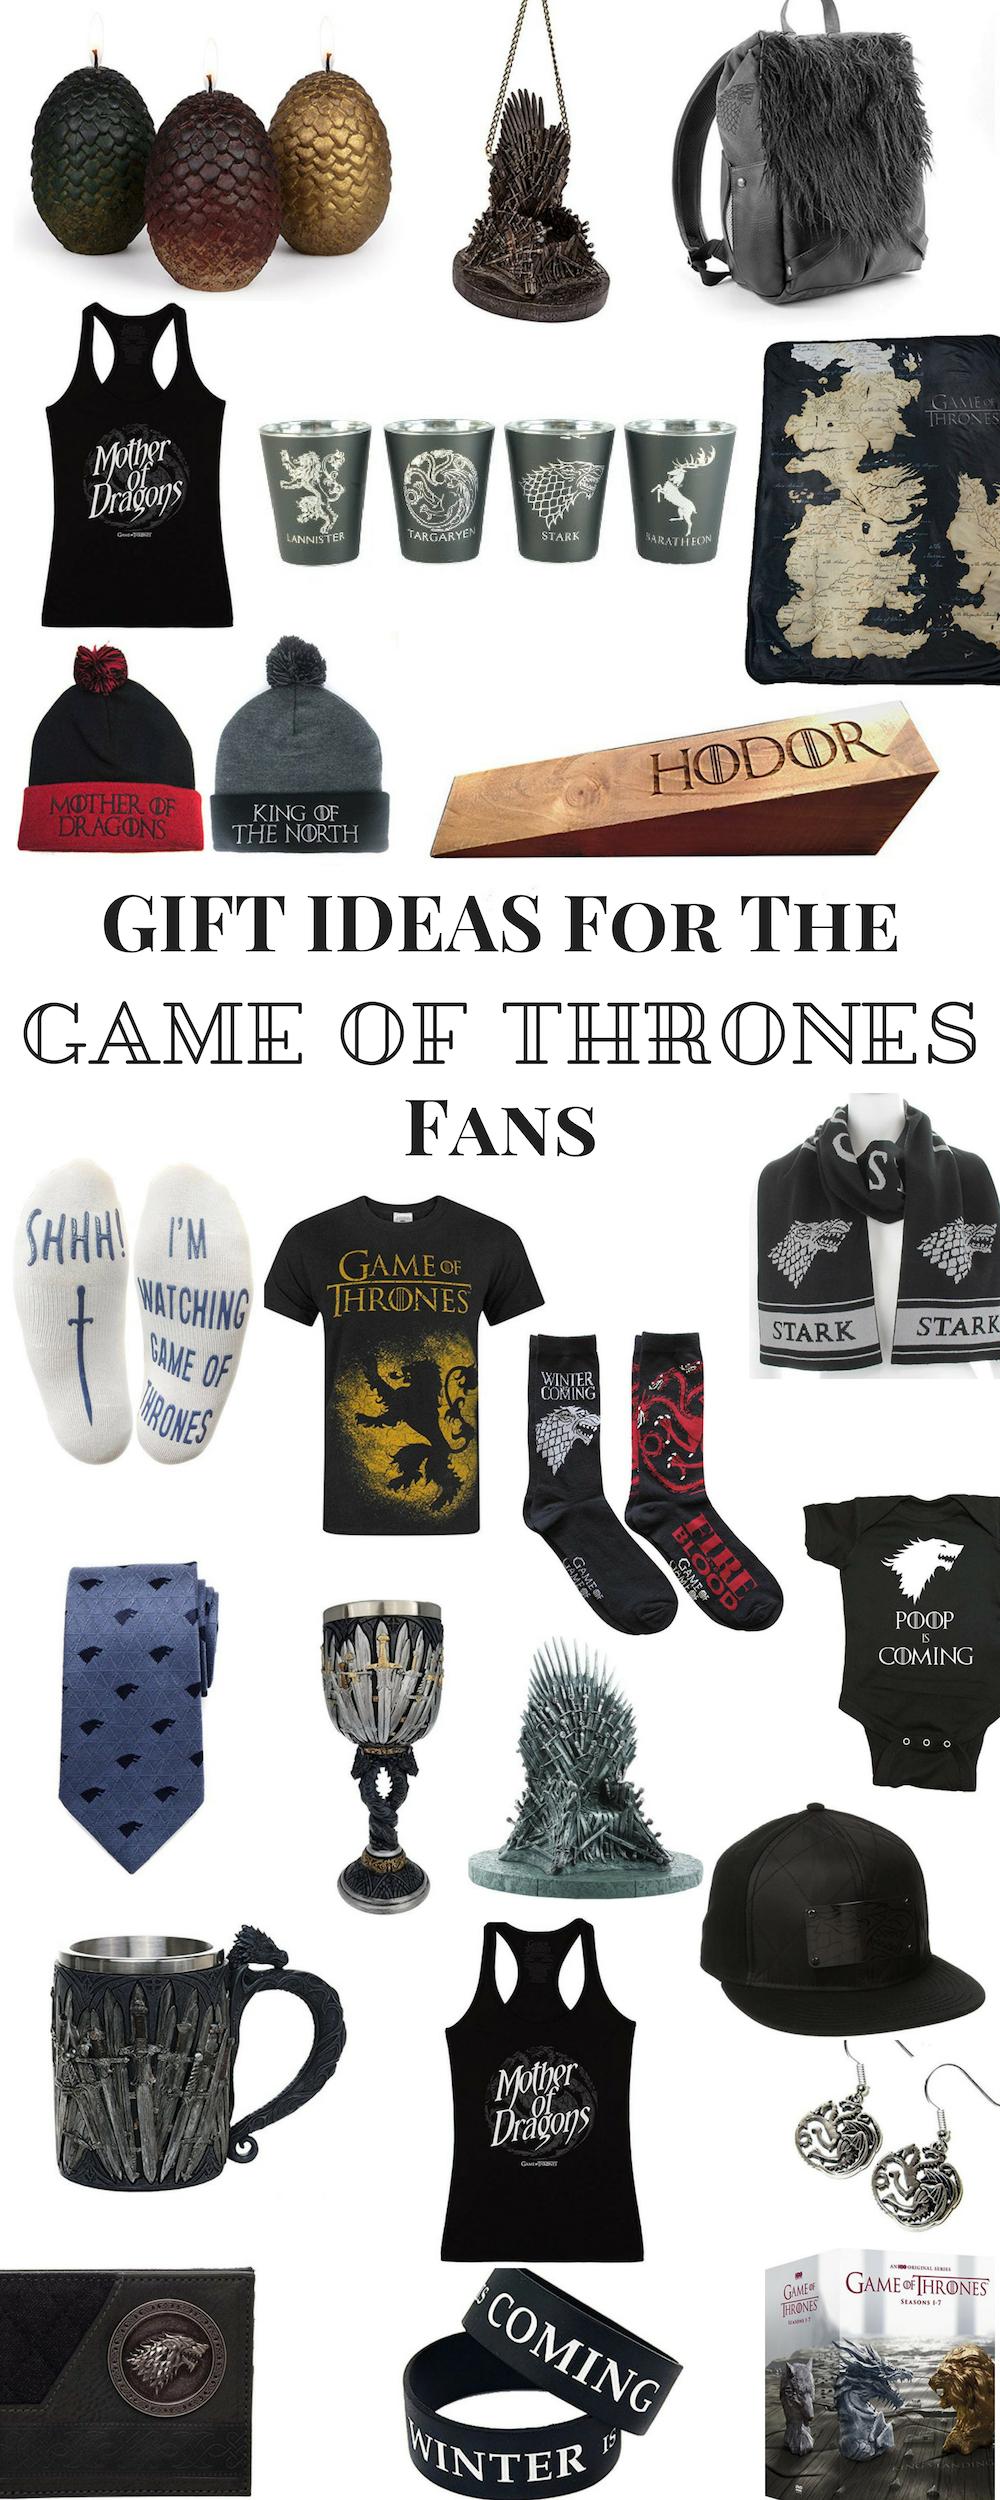 Super Game of Thrones Gift Guide - ourkindofcrazy.com HR-49